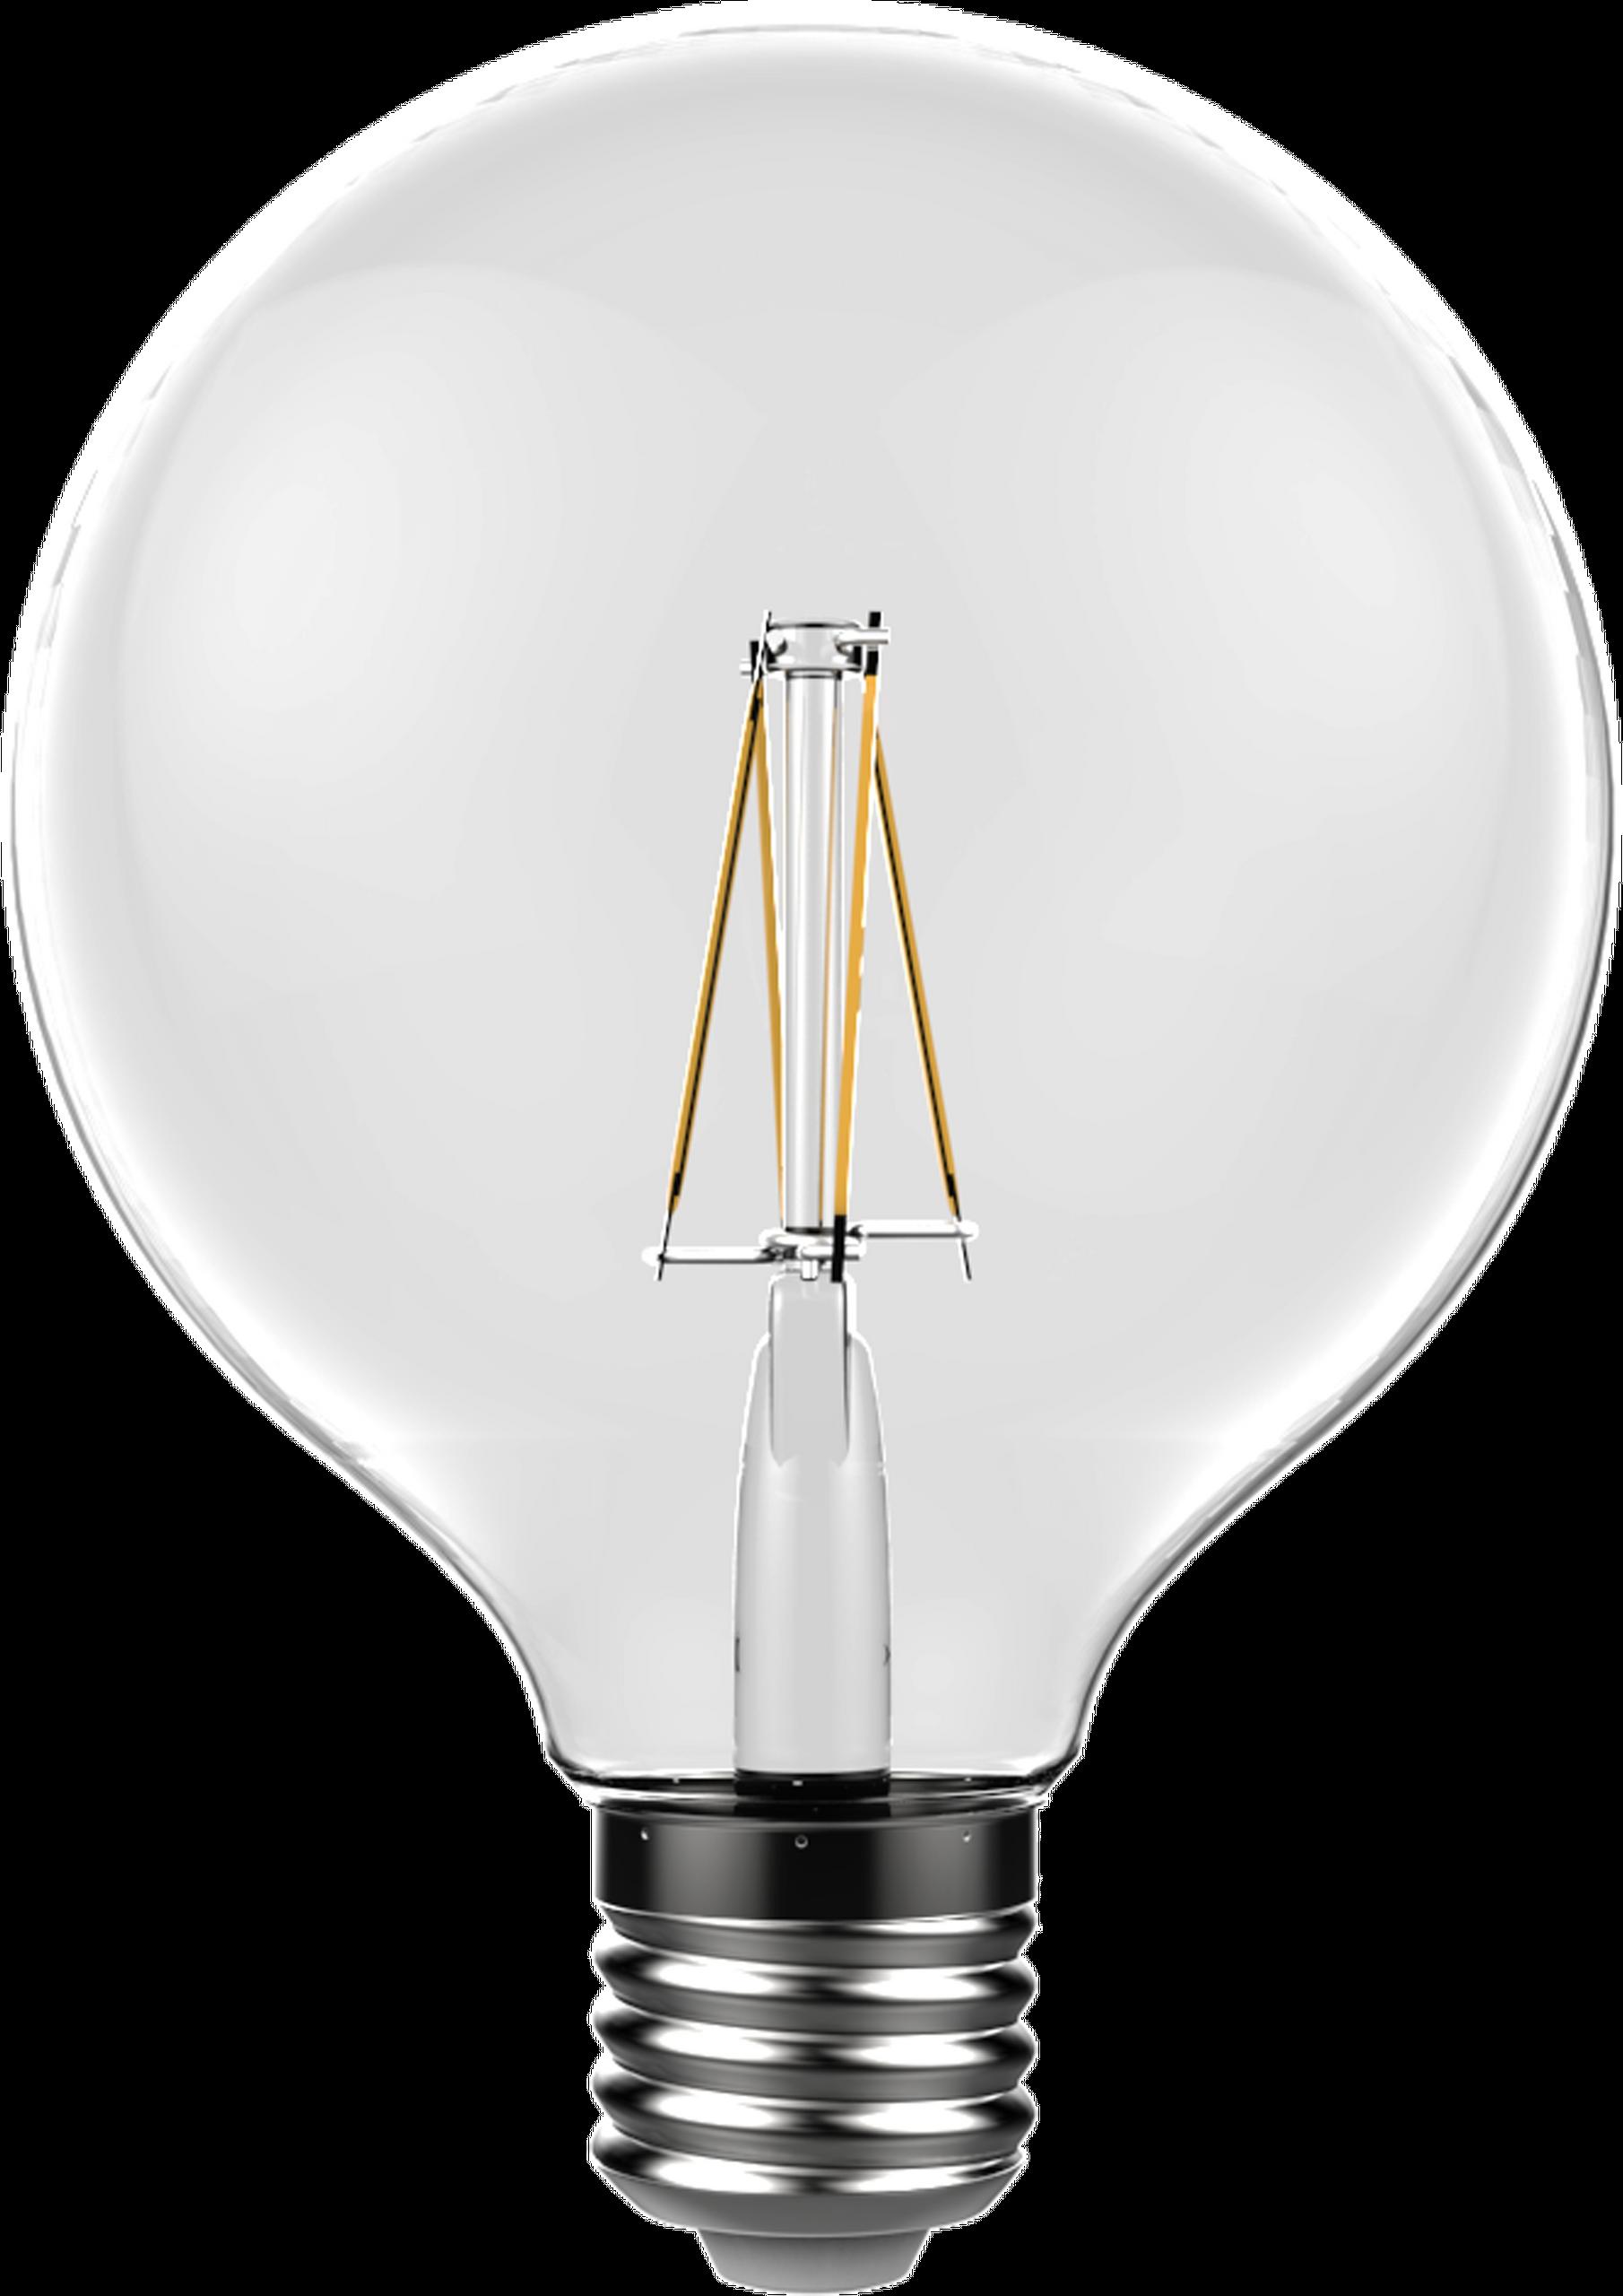 G125-E27 Wunderbar Sind Led Lampen Dimmbar Dekorationen